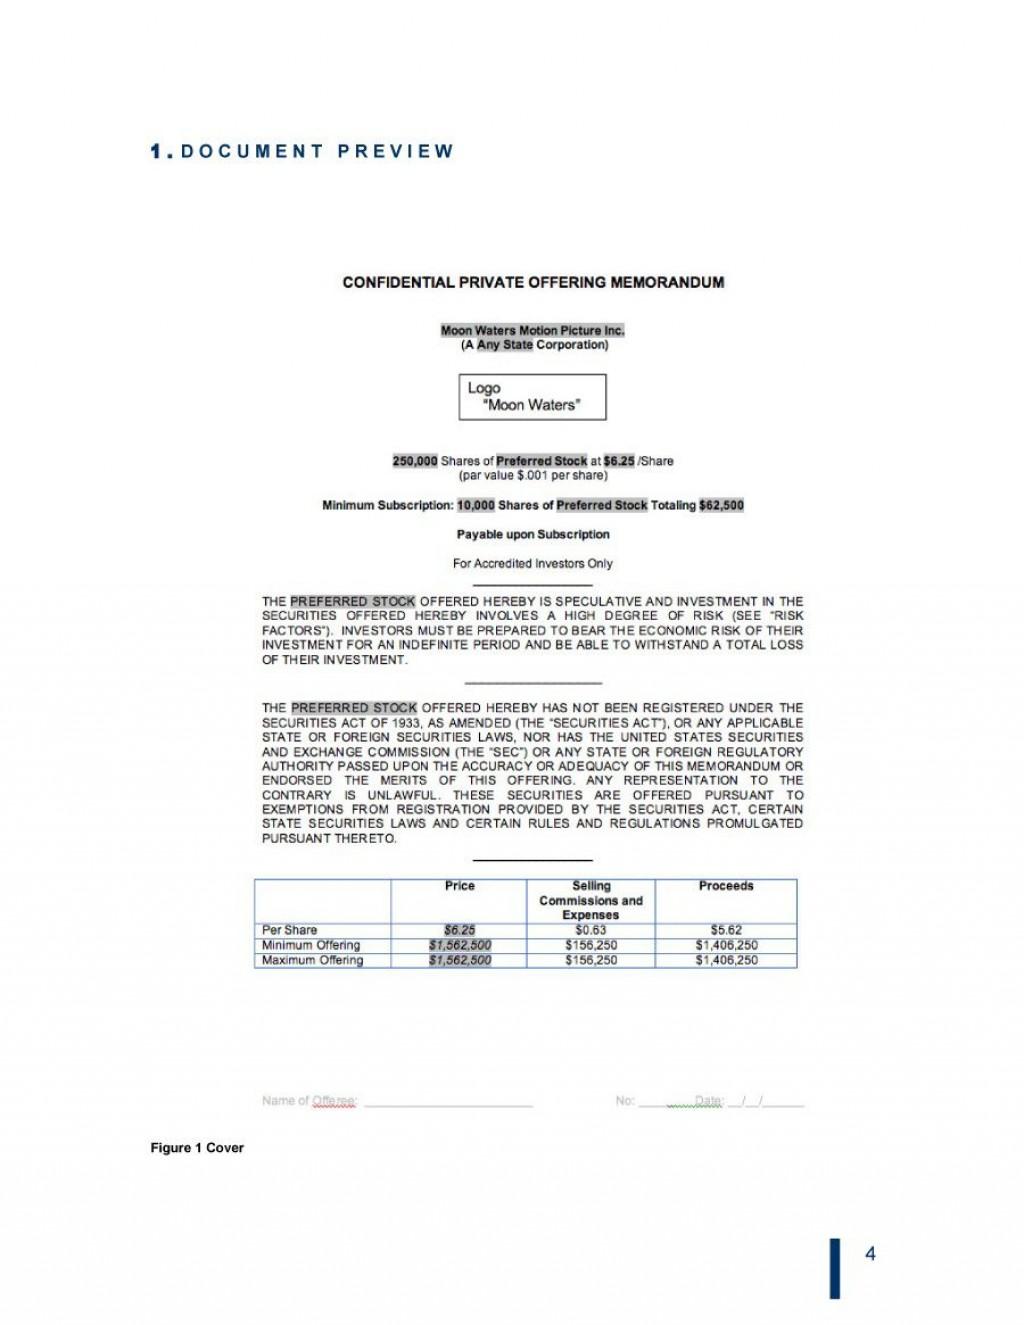 007 Stupendou Private Placement Memorandum Template Free Download Design Large